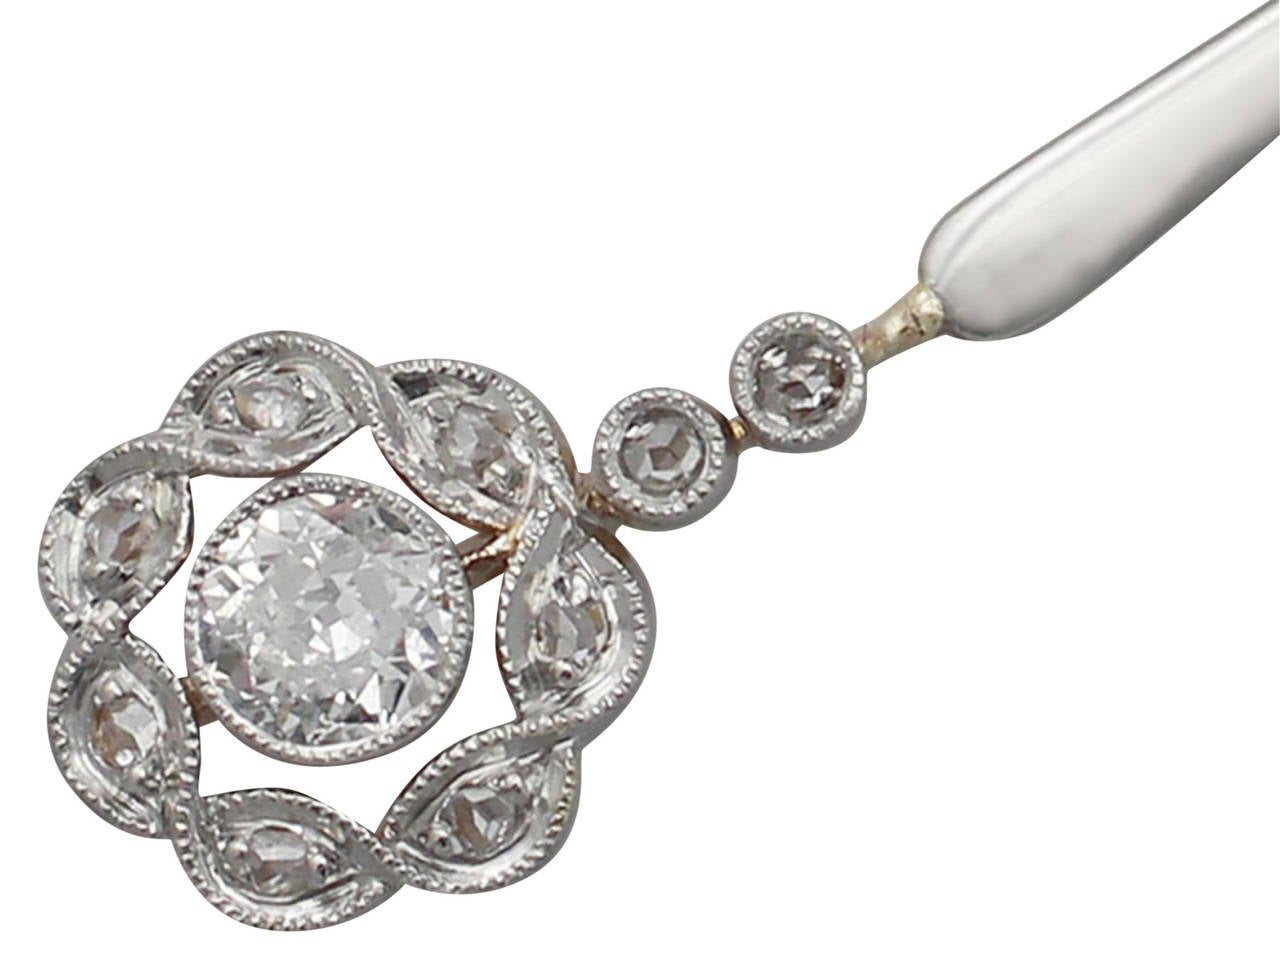 Women's 0.57 Ct Diamond, 18 k Yellow Gold, 18 k White Gold Set Pendant - Antique For Sale